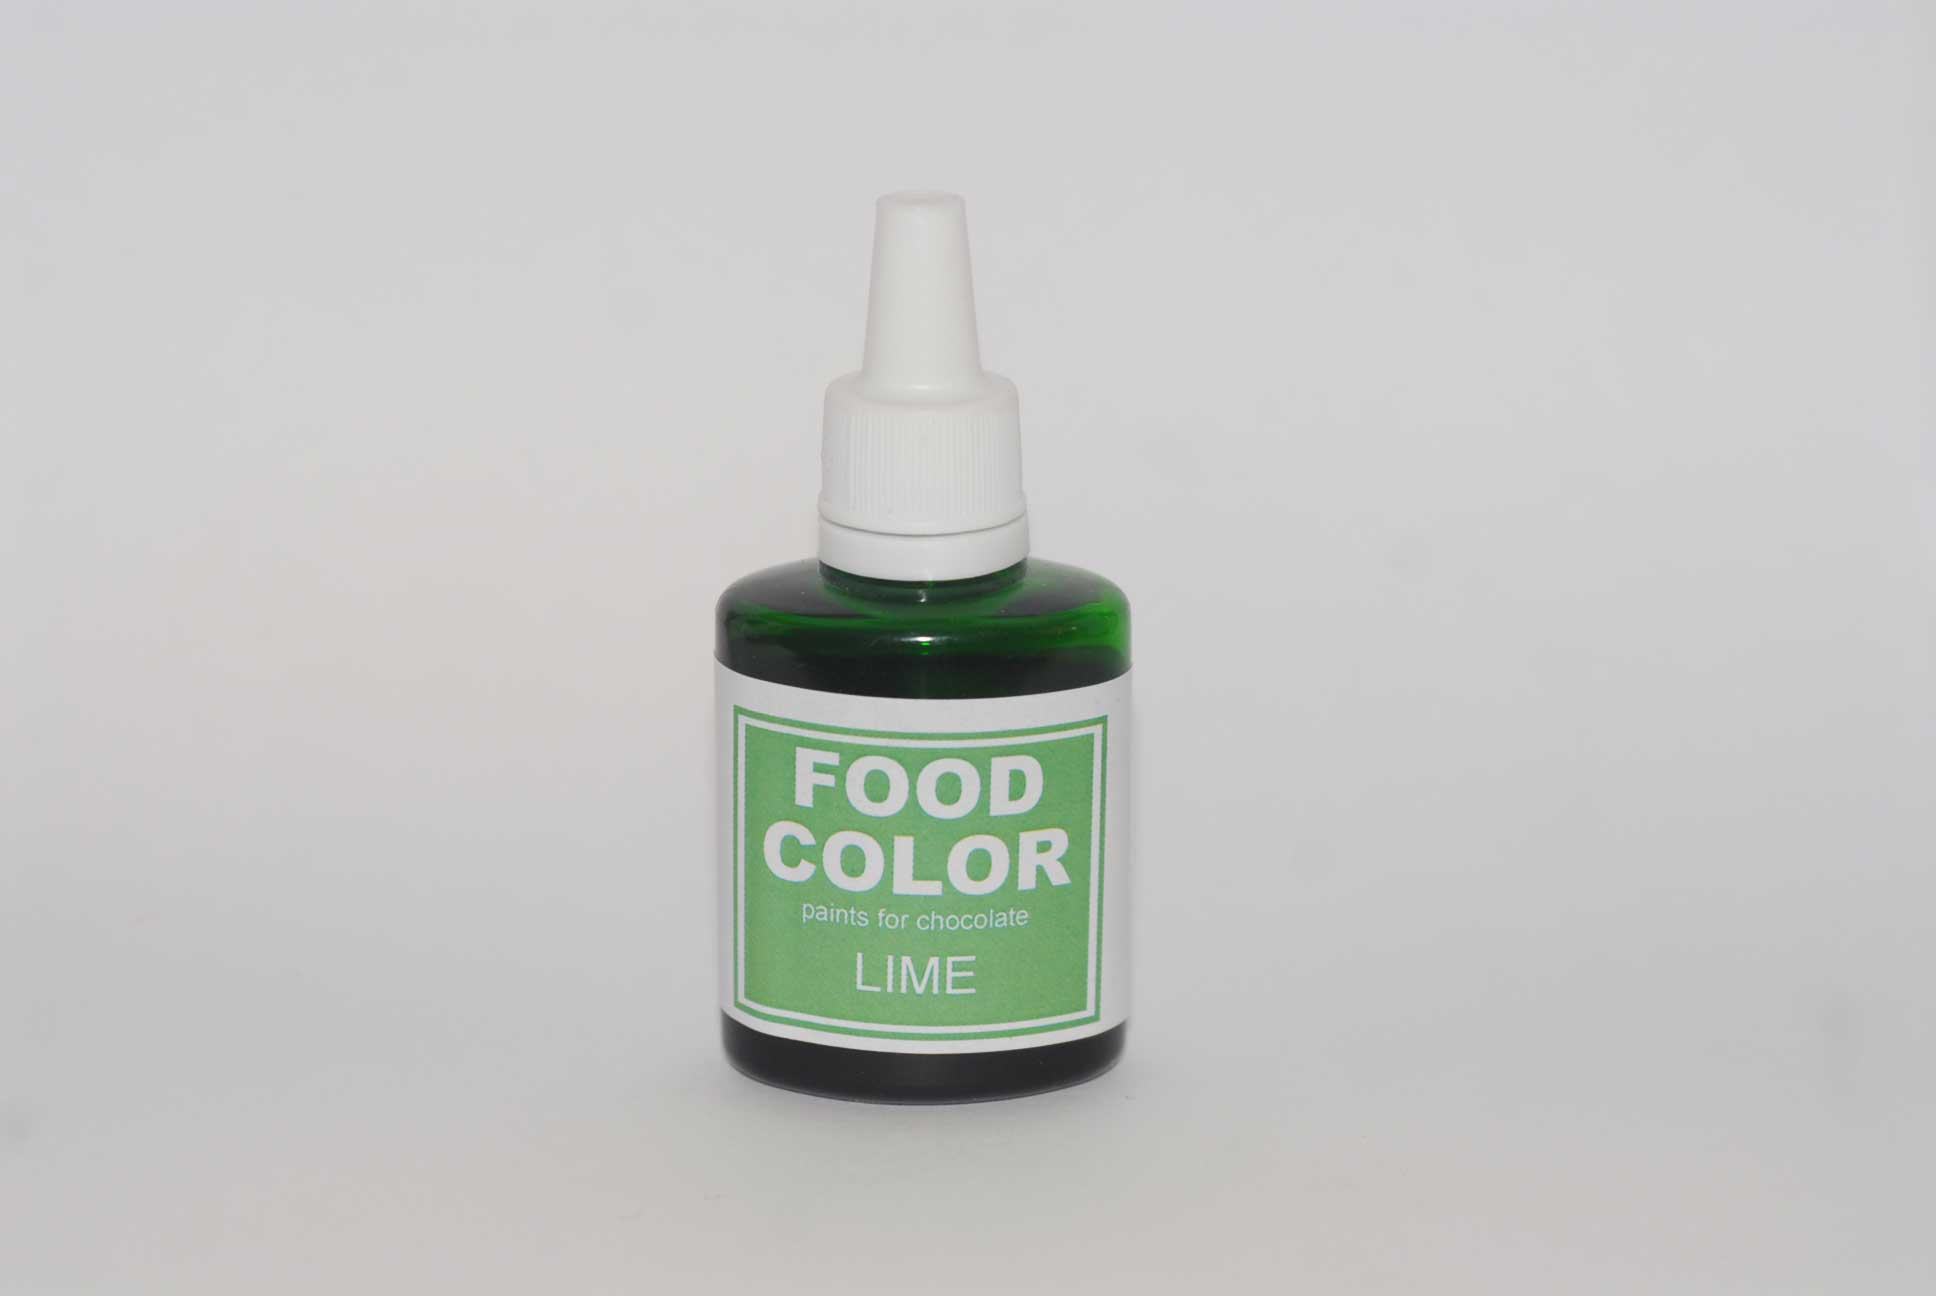 Краситель для шоколада FOOD COLOR Lime / Лайм, 25 гр